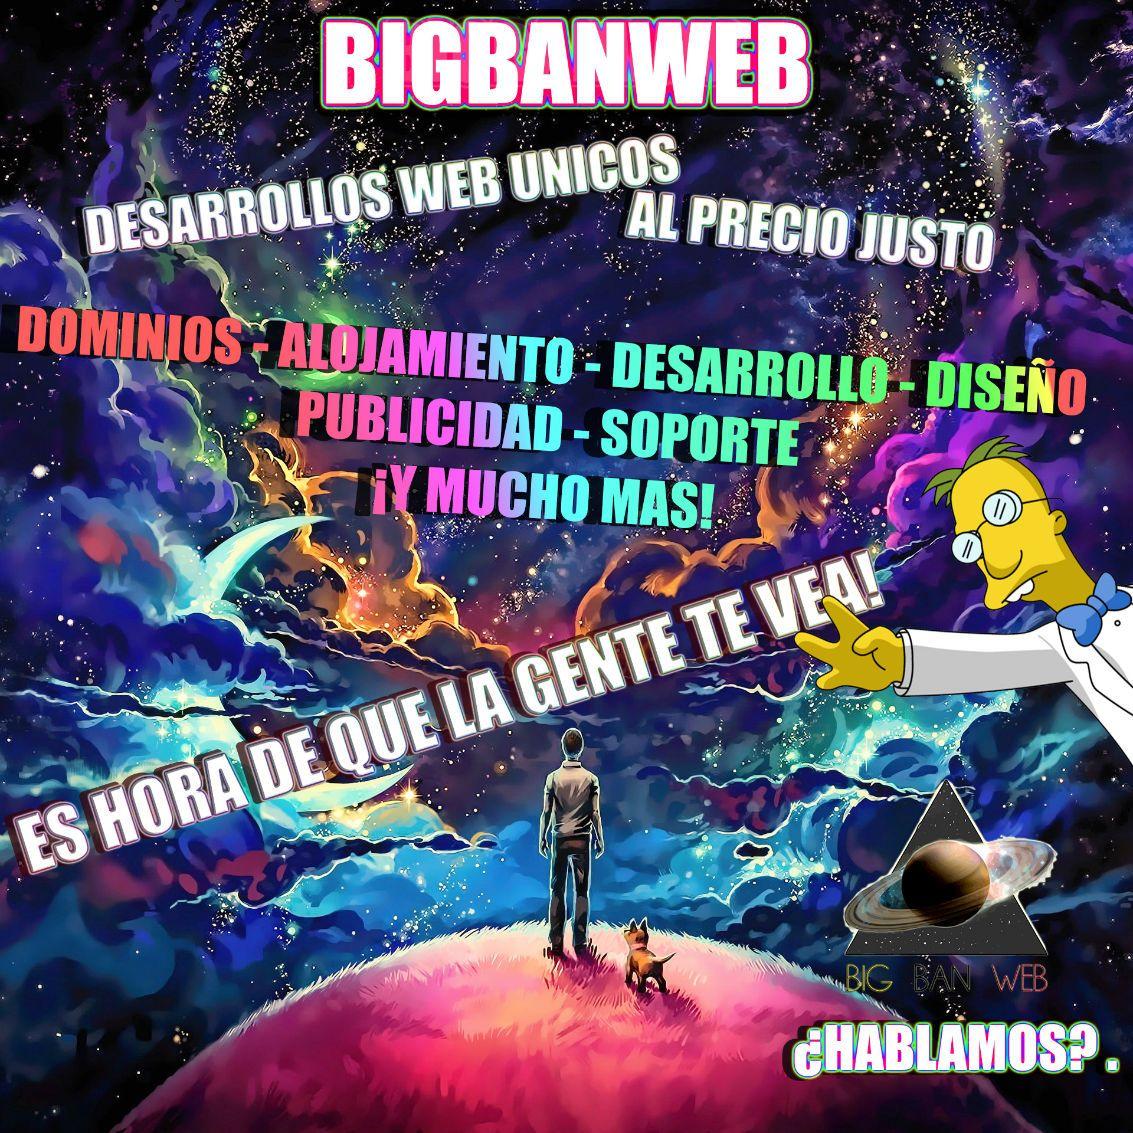 bigbanweb - BigBanWeb Business desde 99,50€